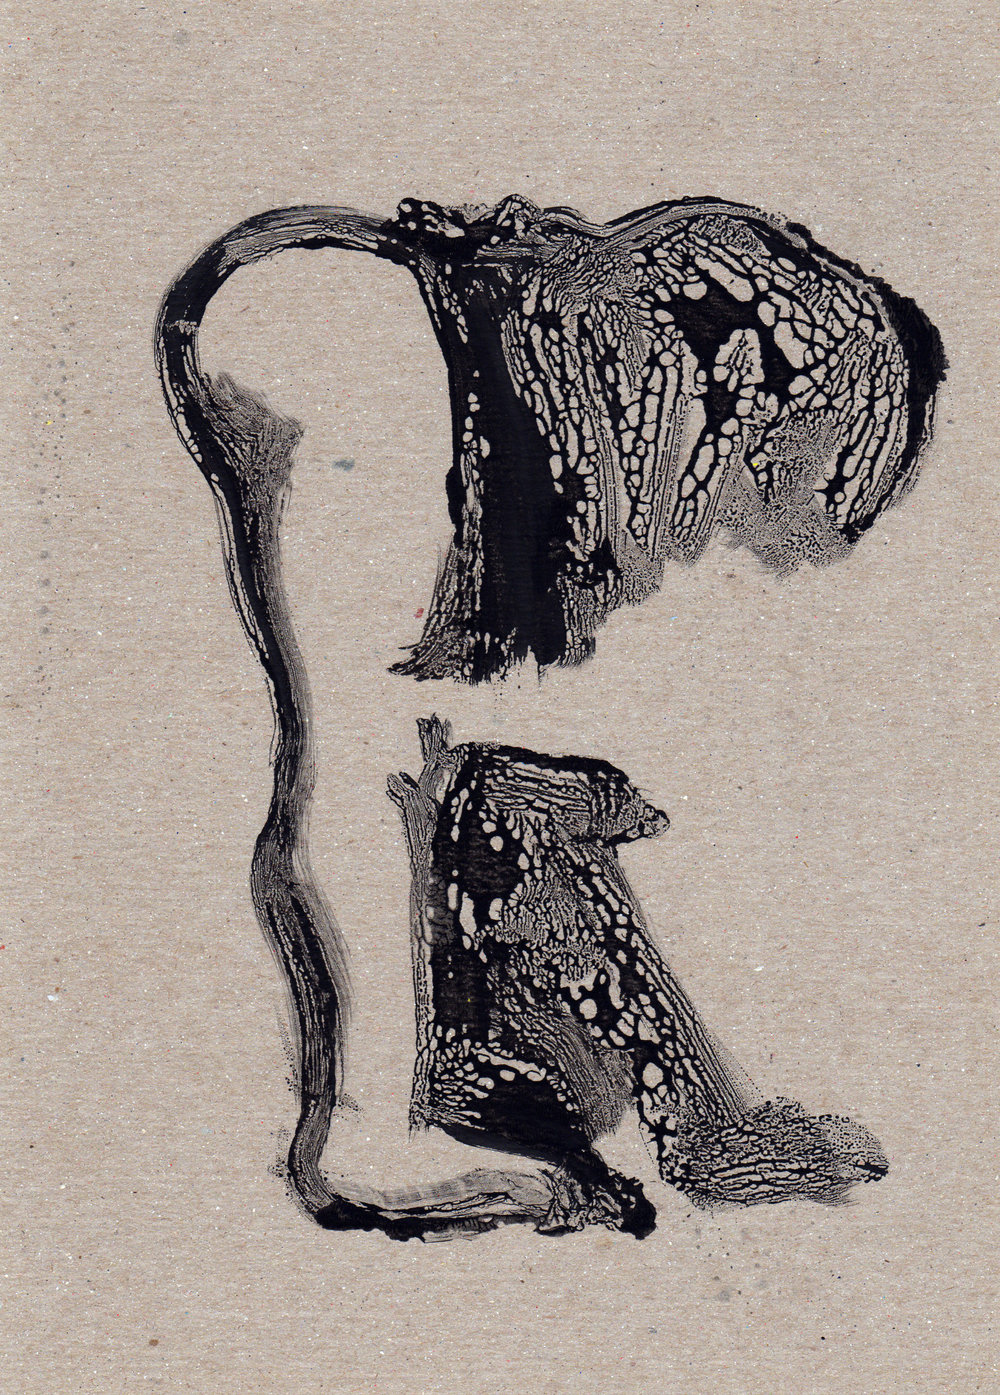 Untitled Revealed, 2014, gelatin monotype, 11x8 inches